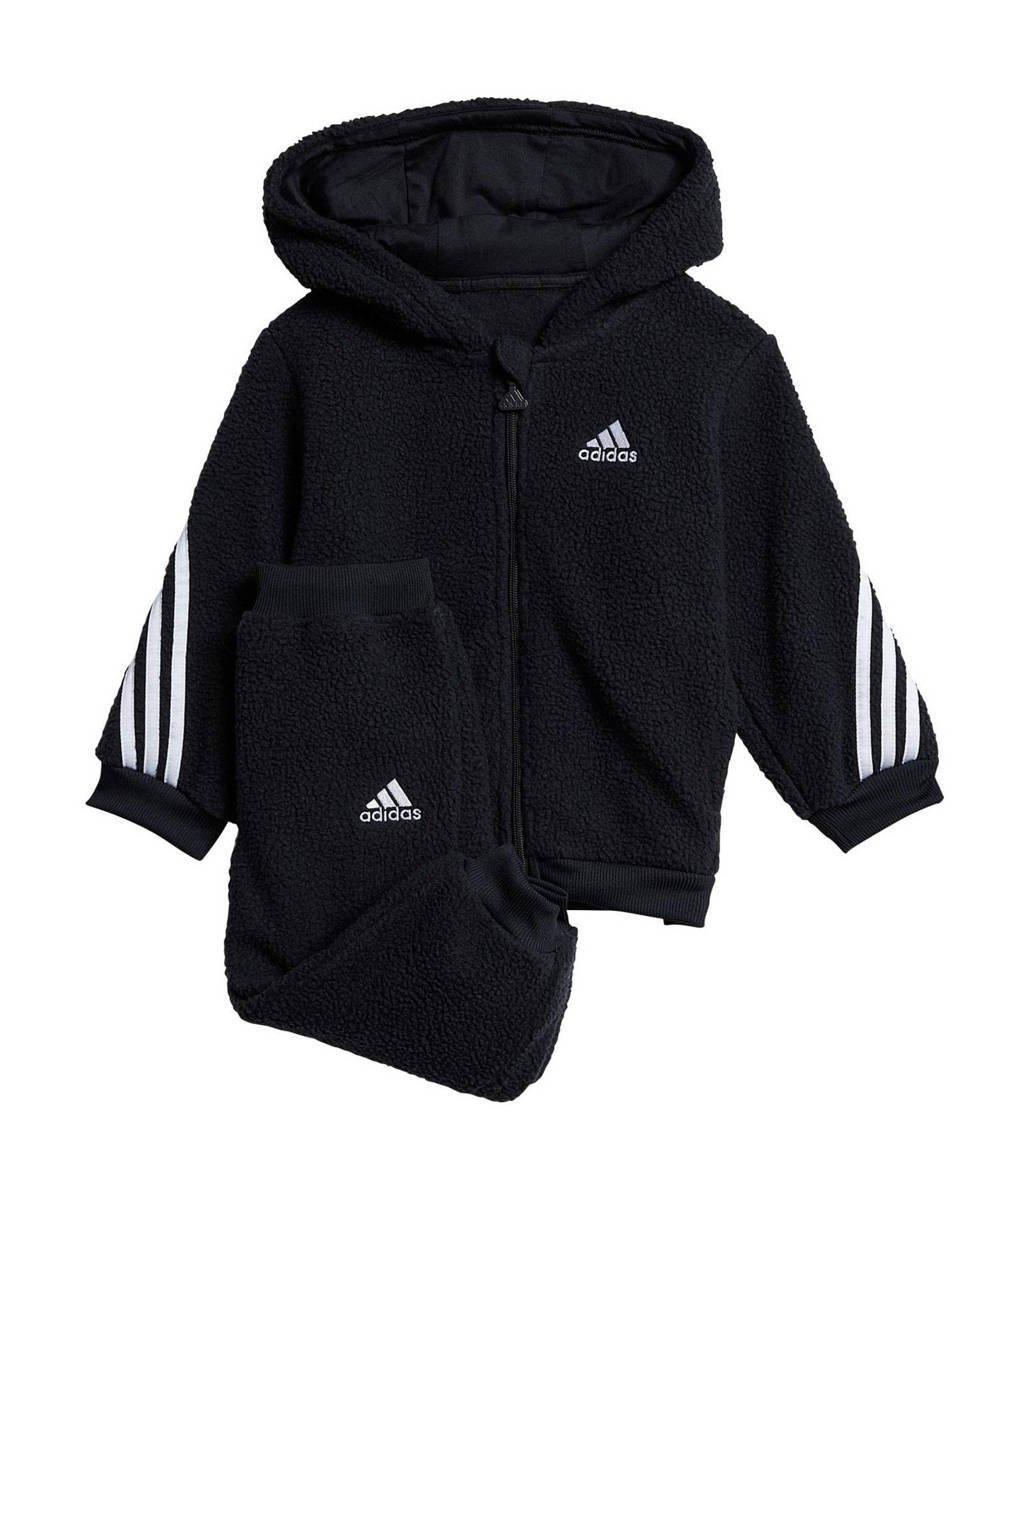 adidas Performance   fleece joggingpak zwart/wit, Zwart/wit